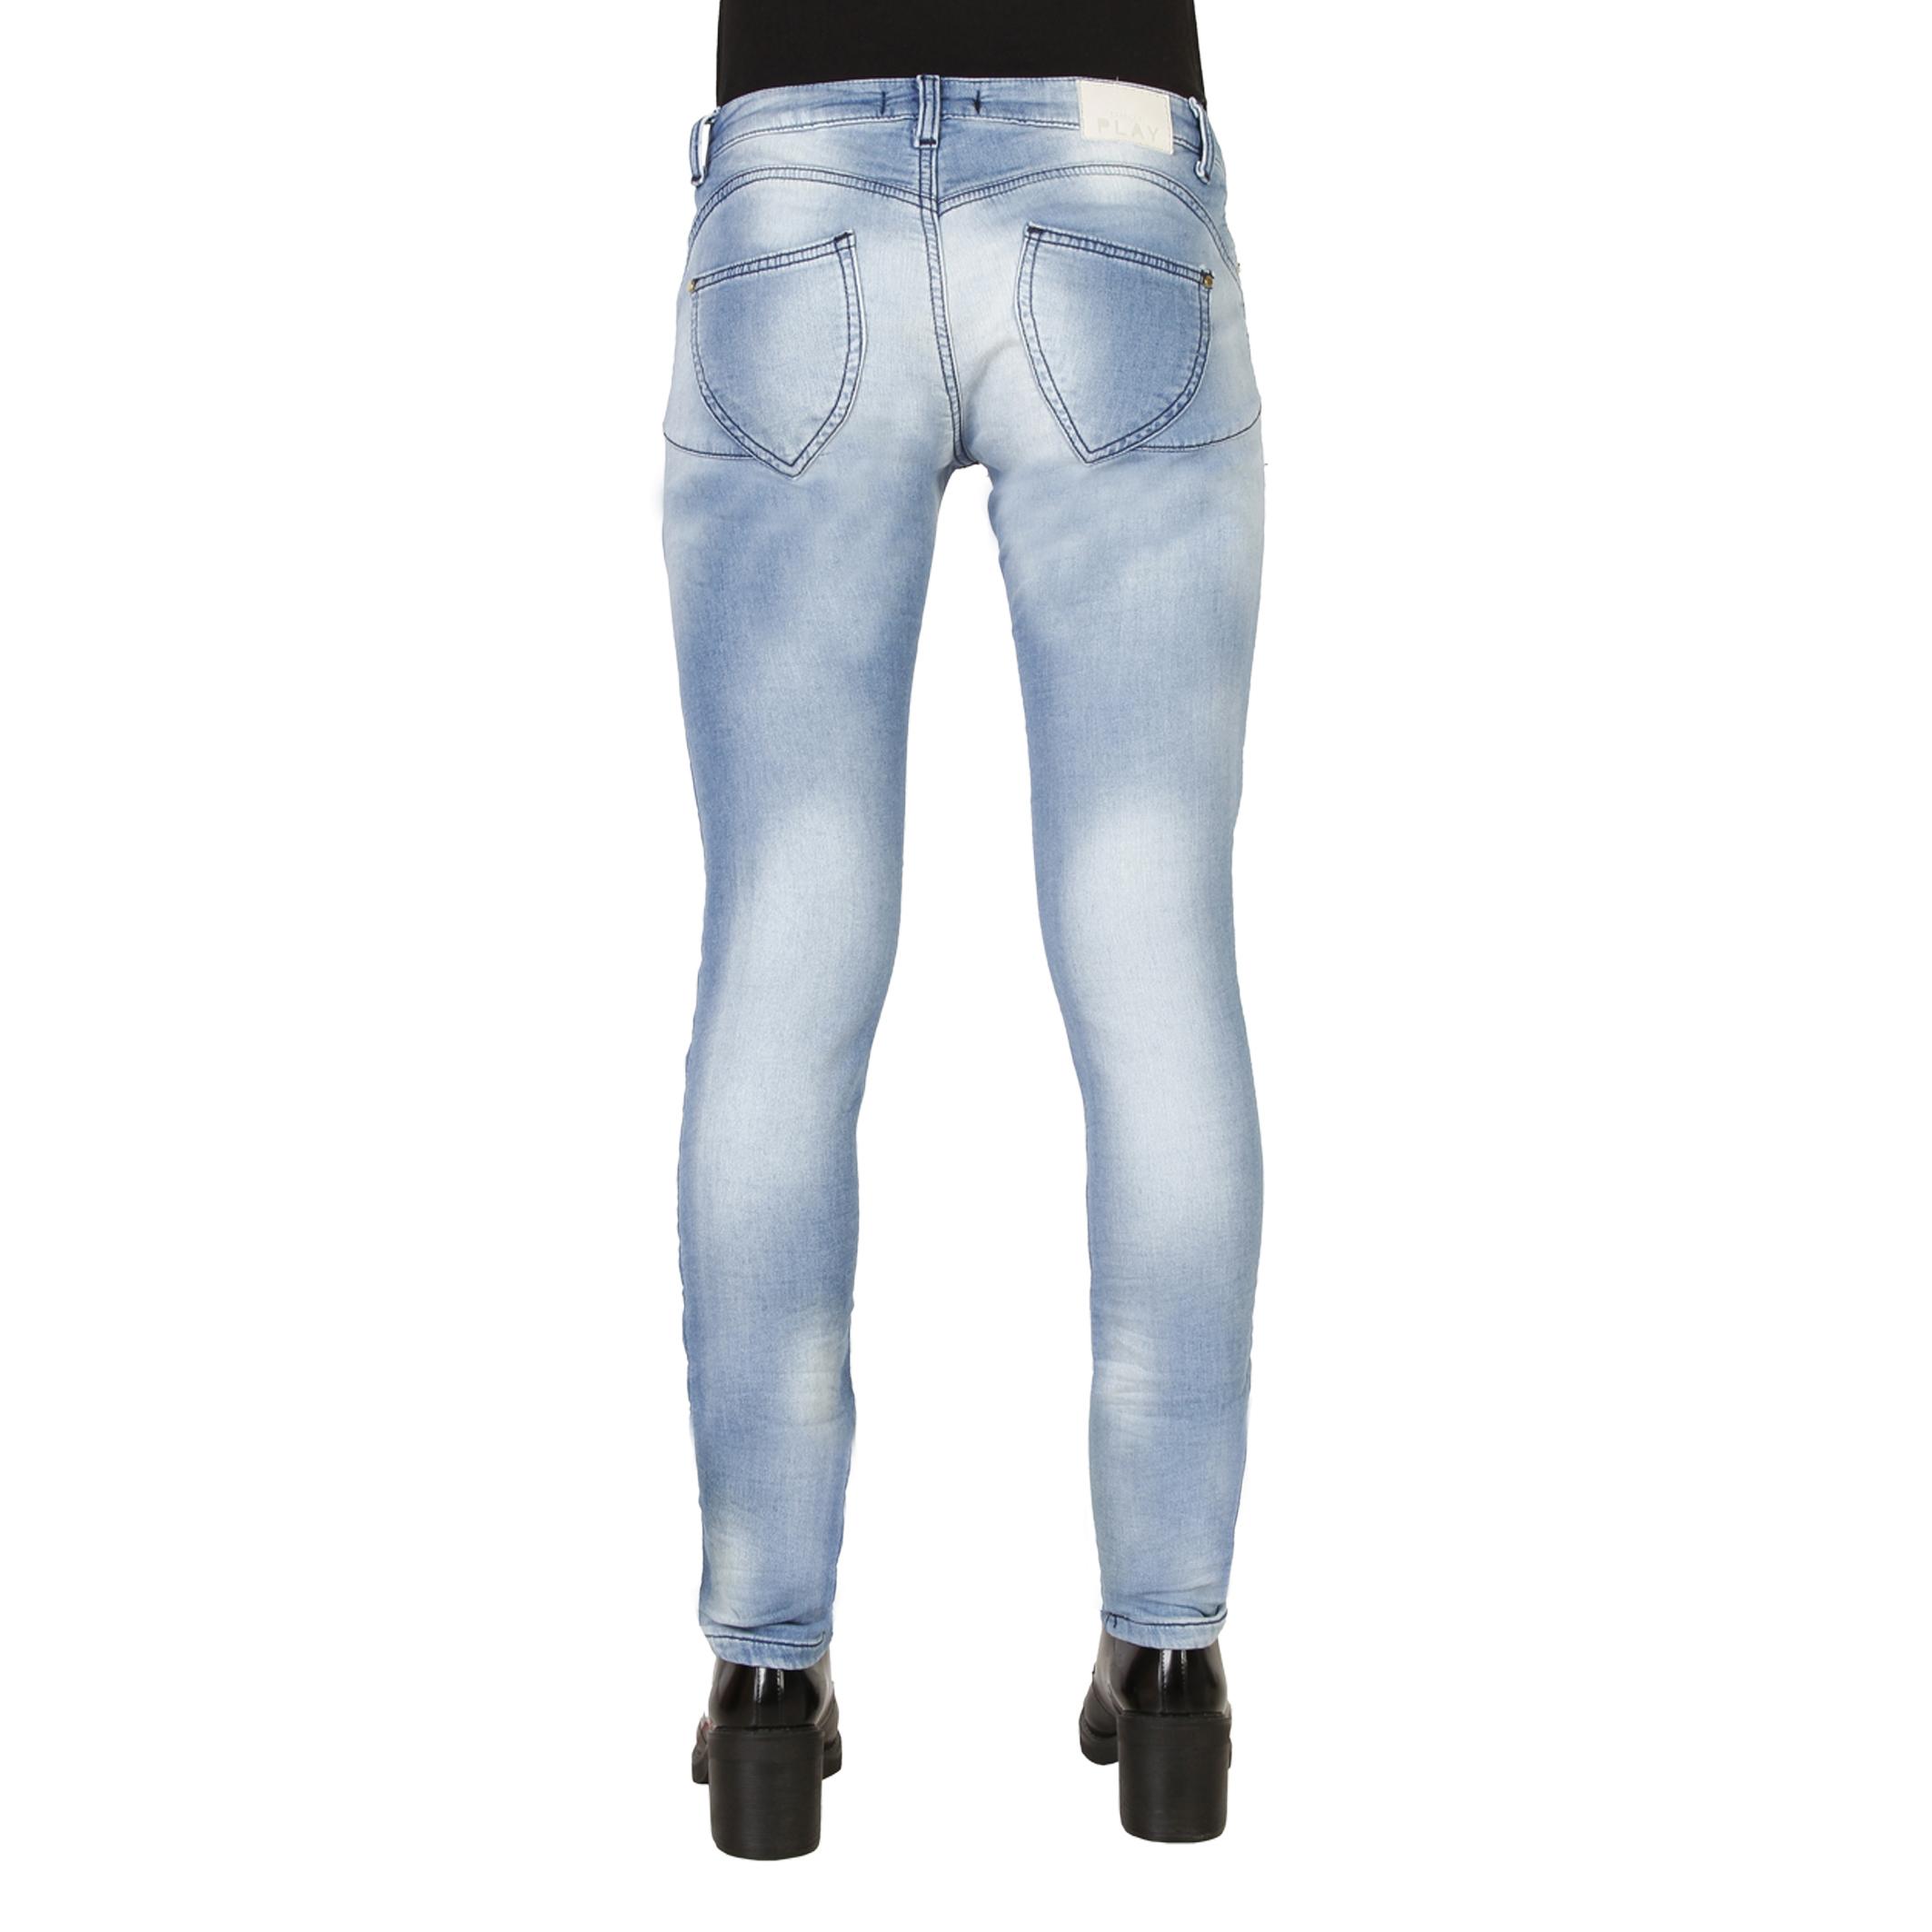 Jeans   Carrera Jeans 000788_0985A blue